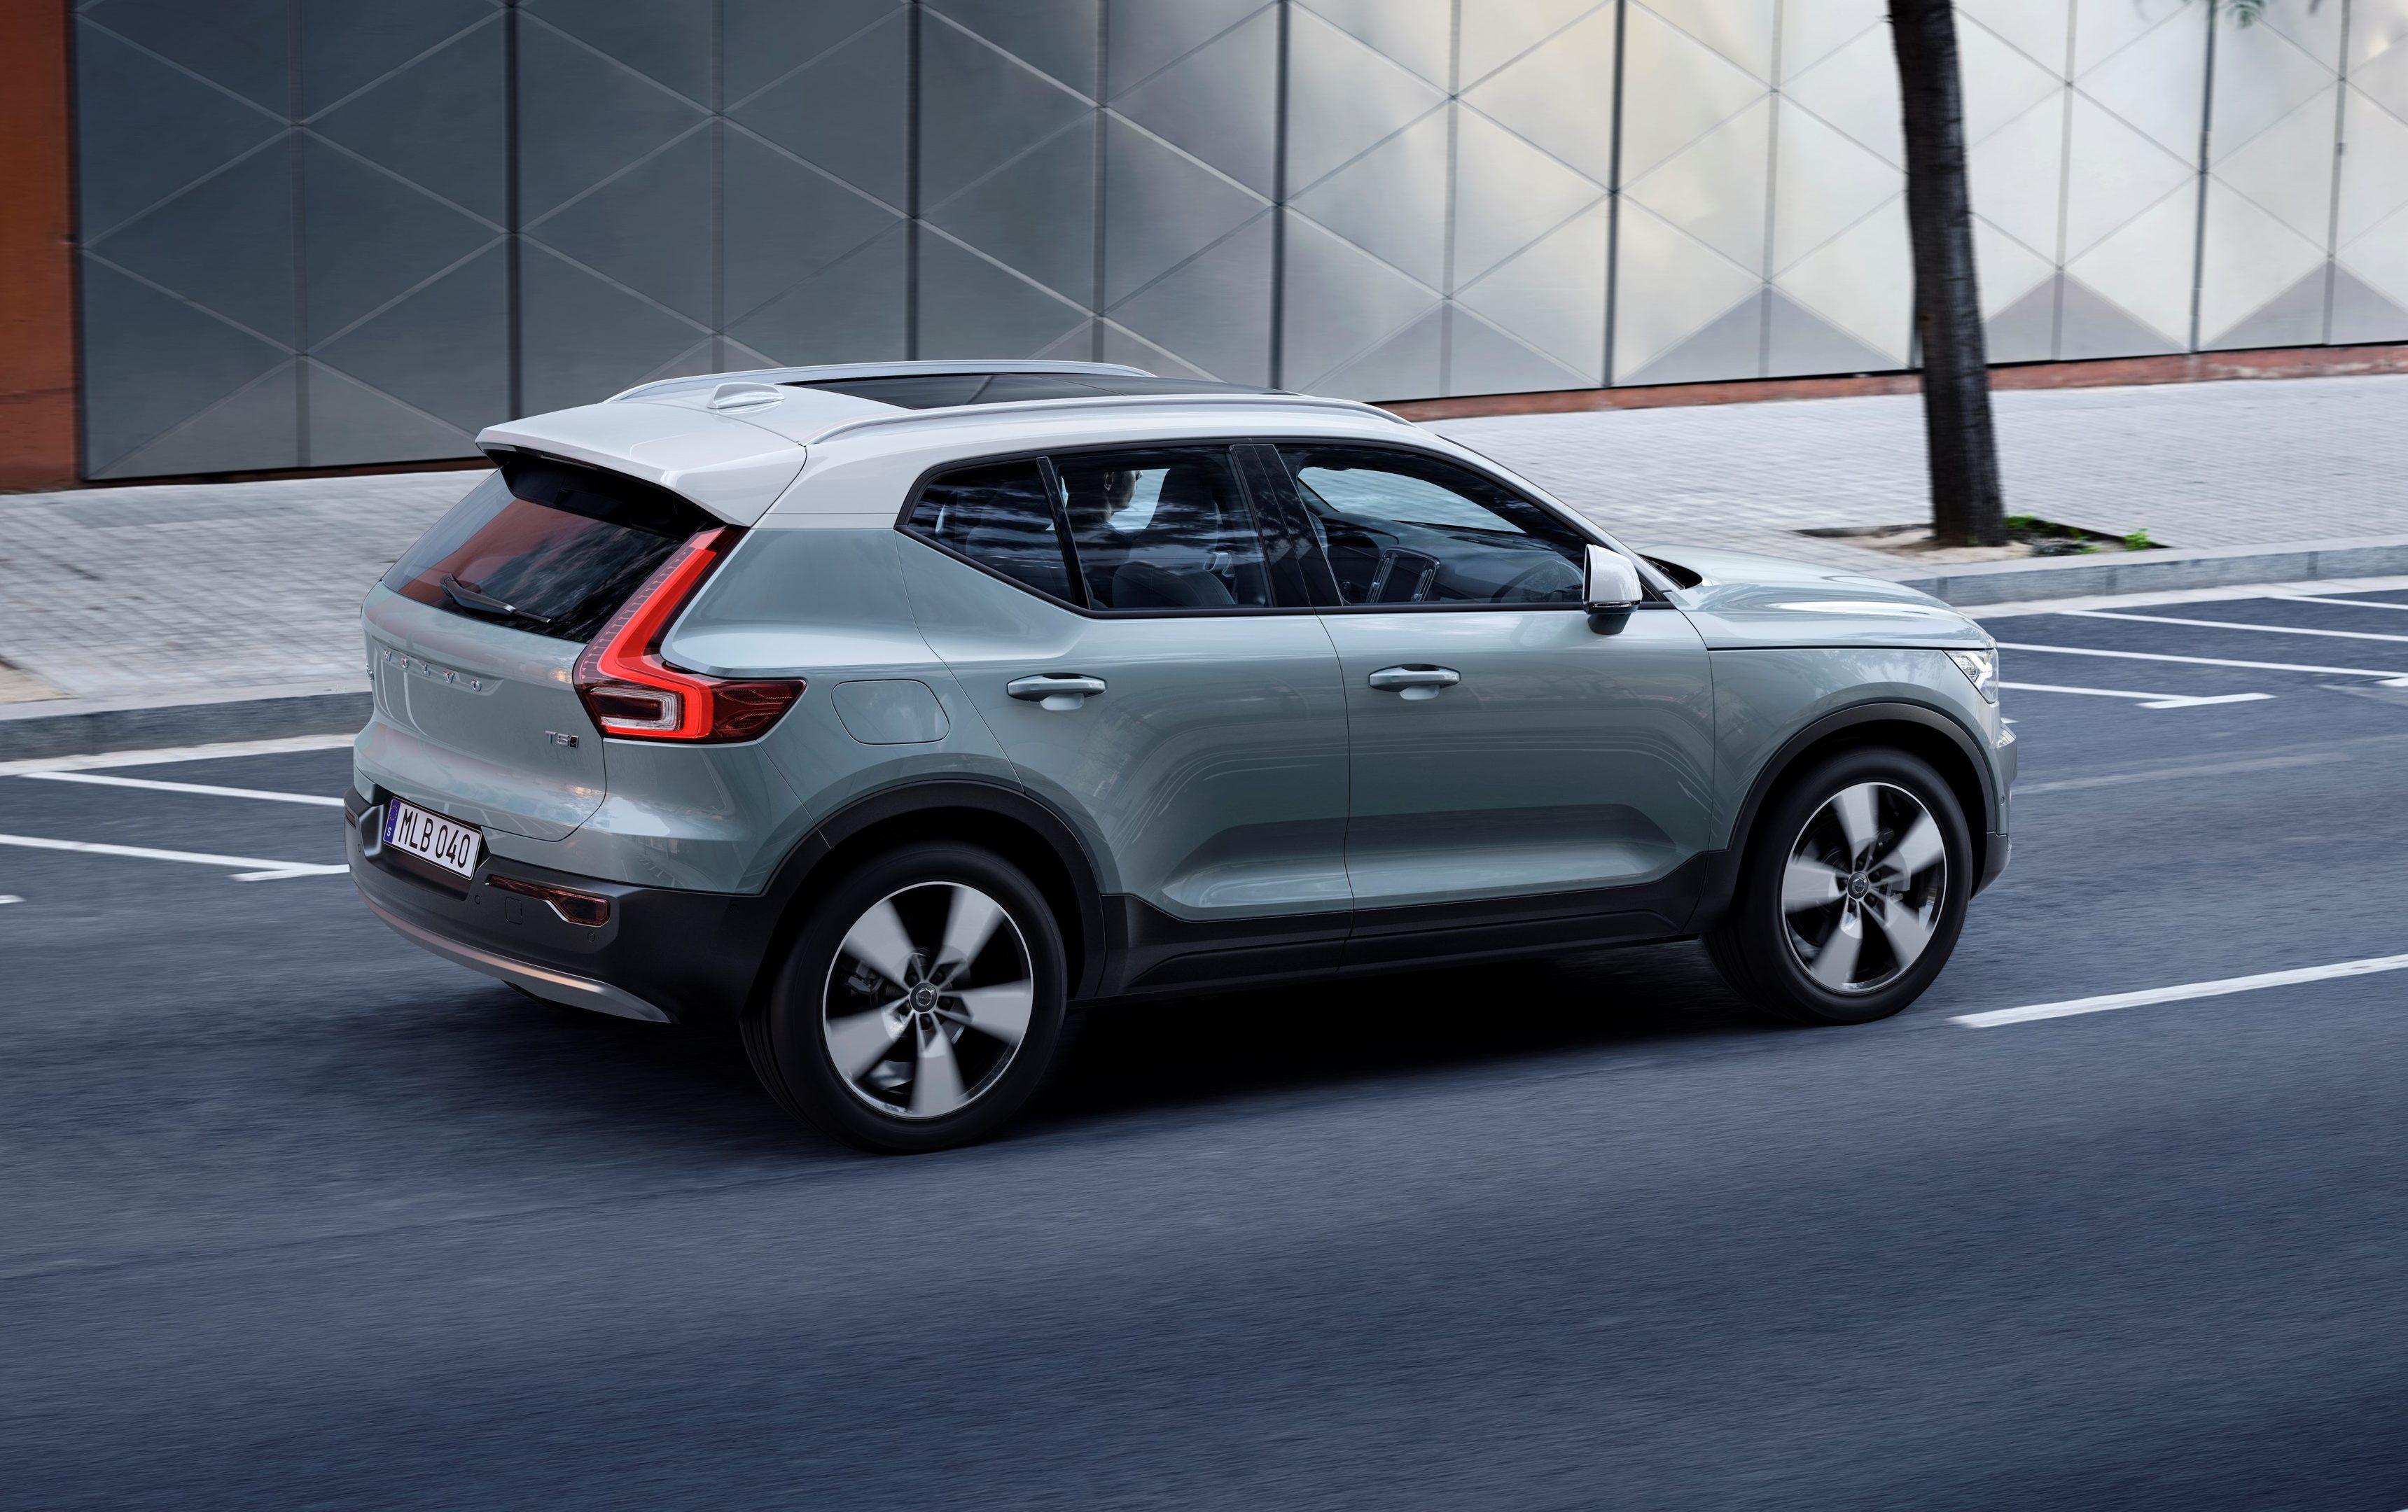 Next Gen Volvo Xc40 Has Two Tone Option Exterior Remains Steel